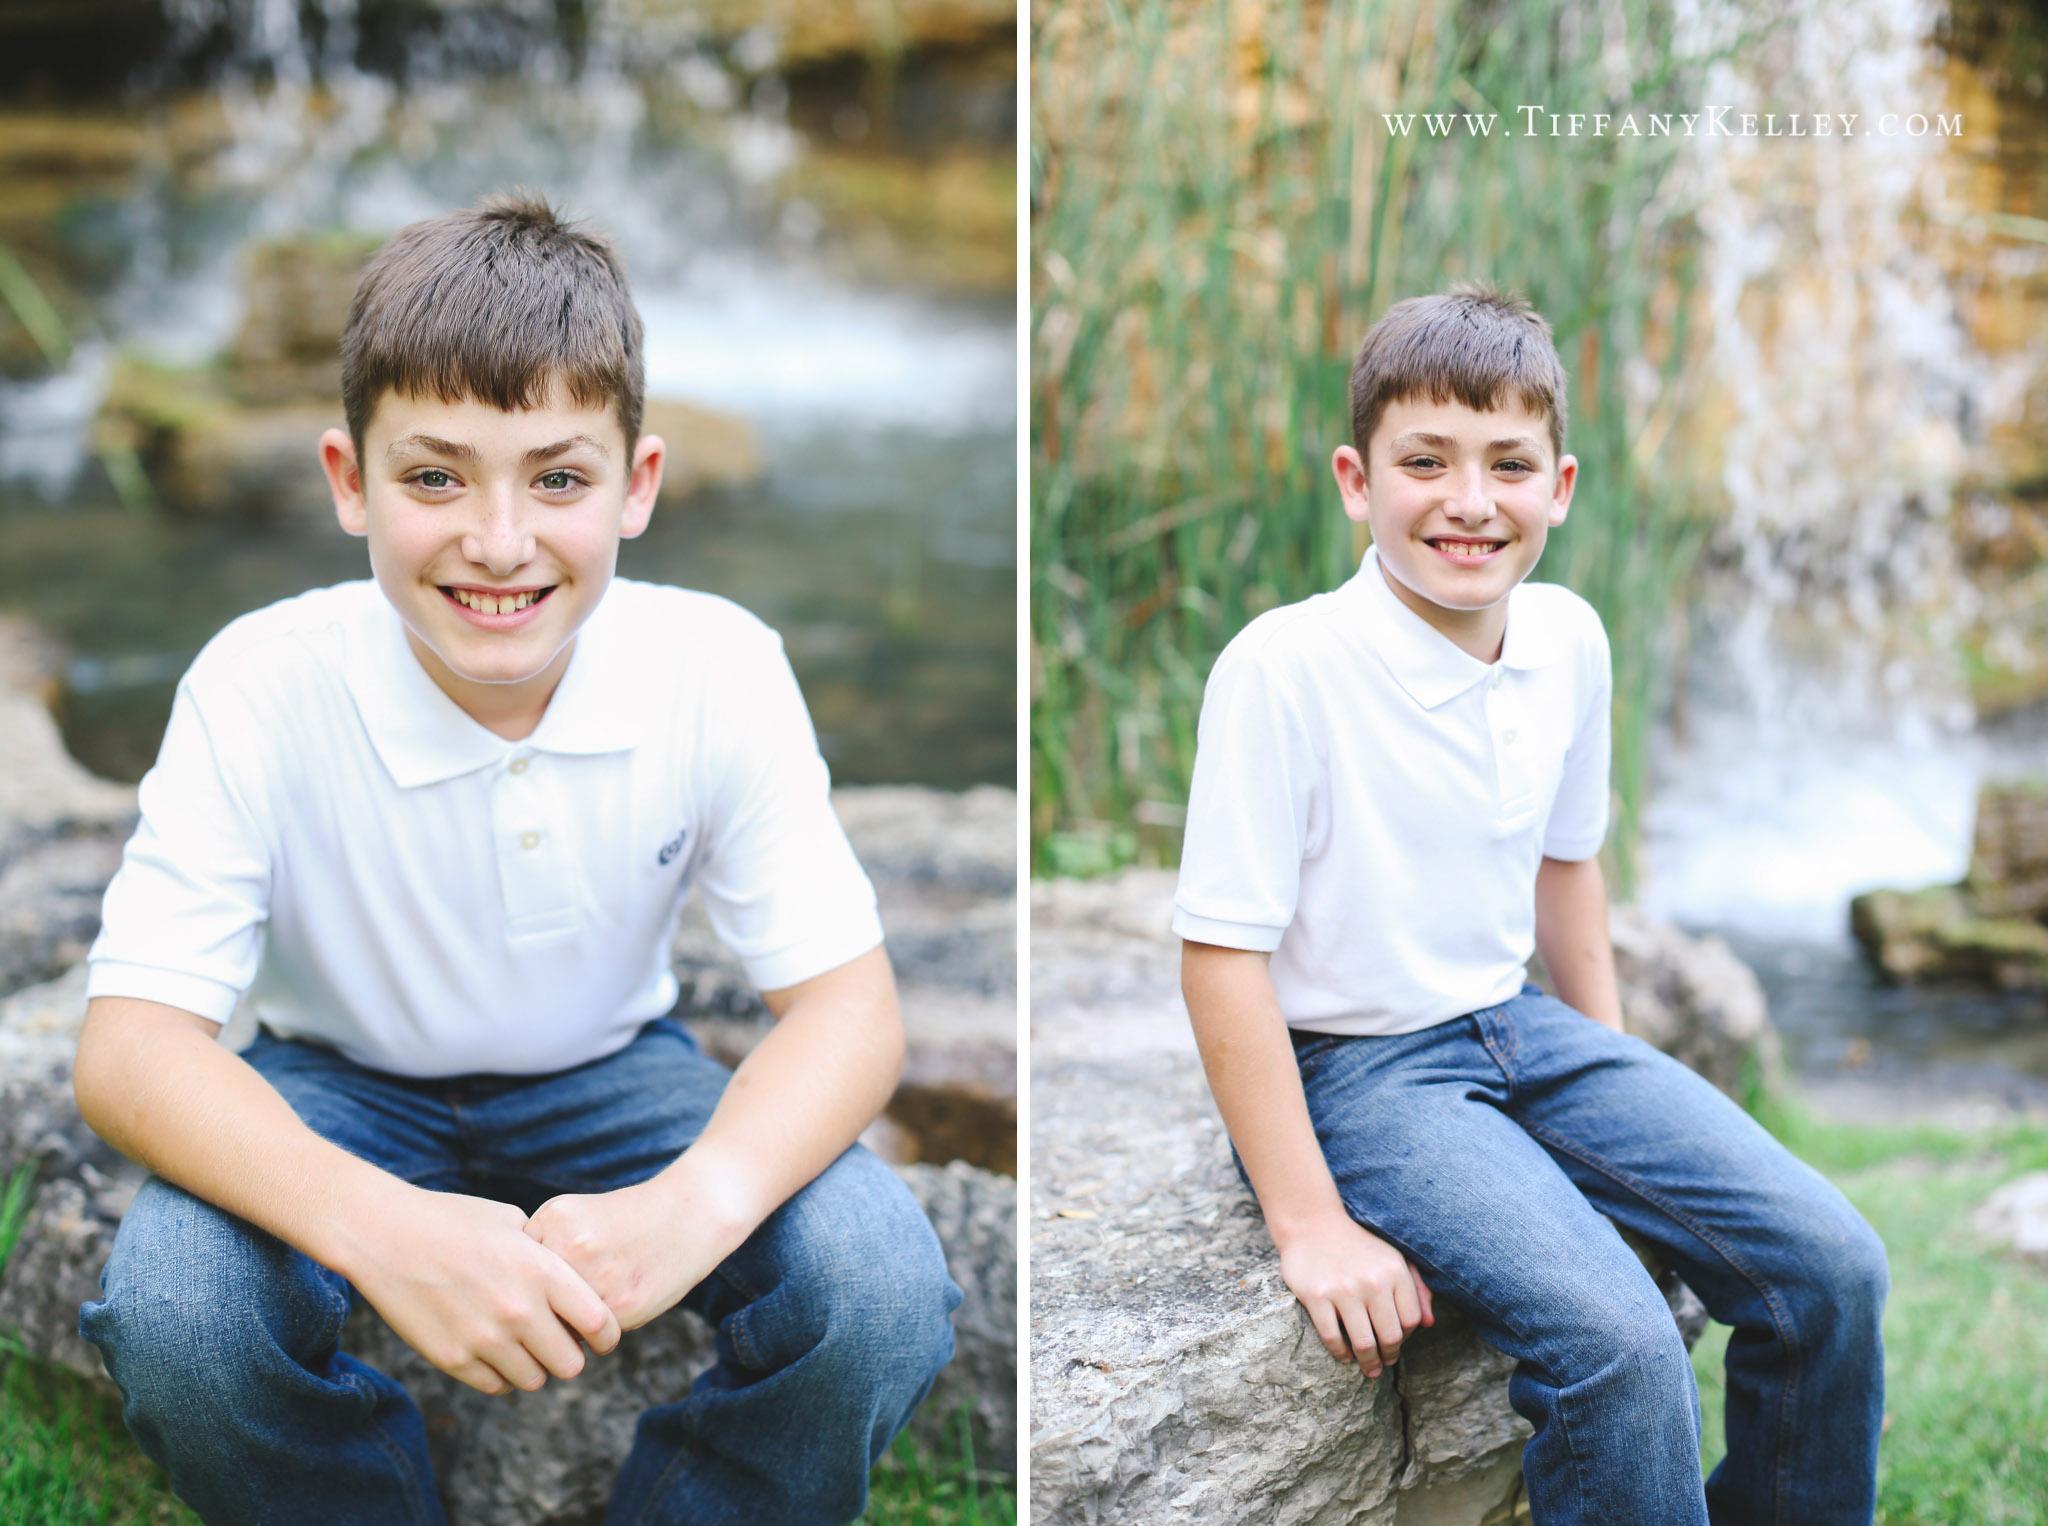 04 Big Cedar Lodge Photographer - Branson MO Family Photographer - Tiffany Kelley Photography